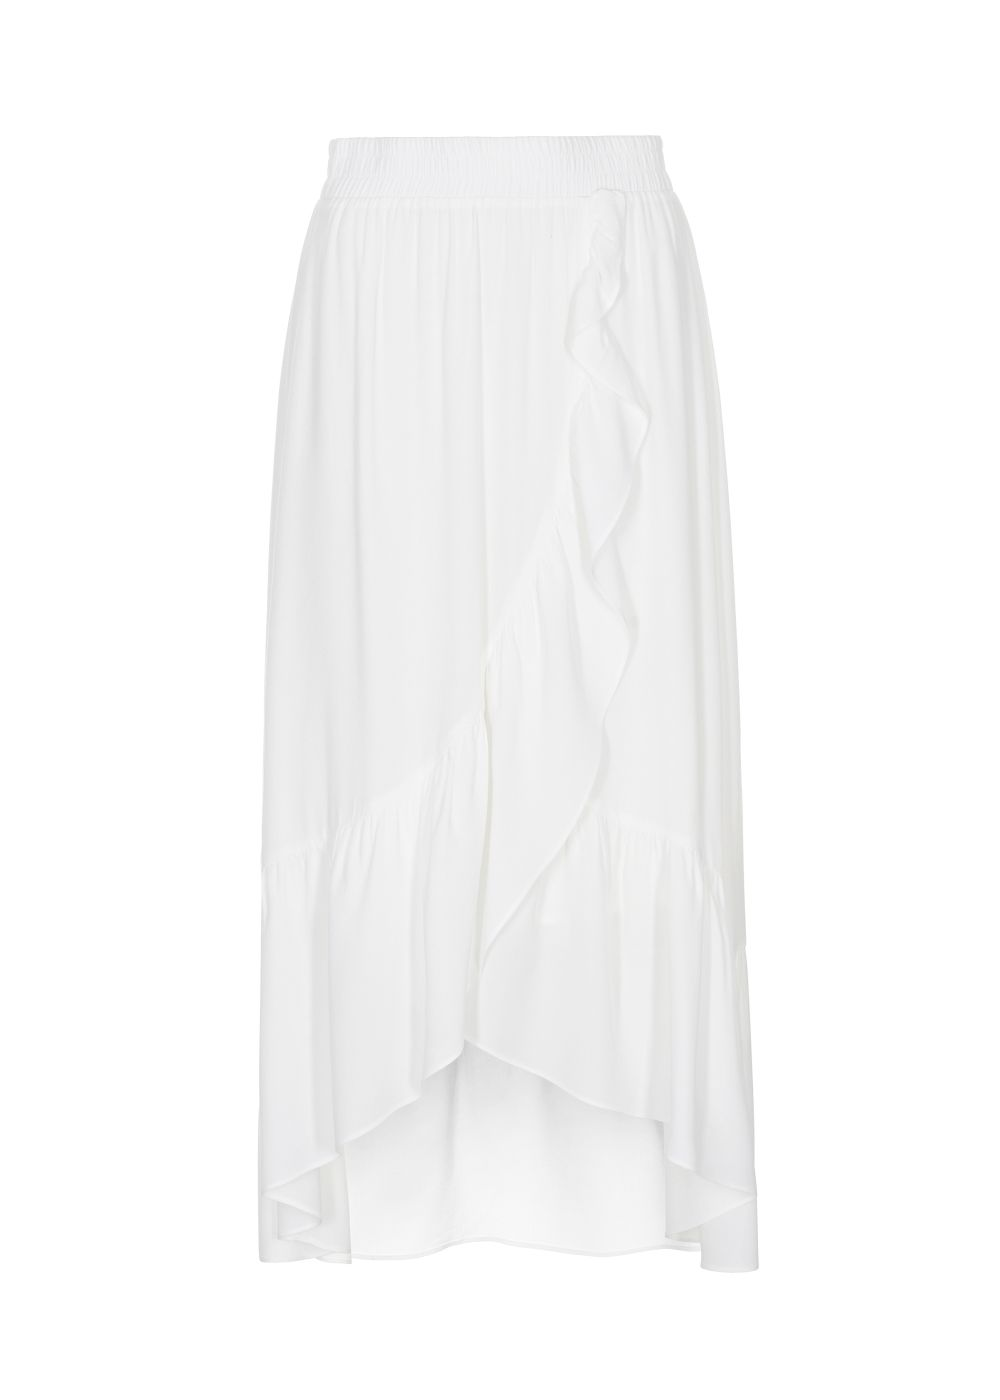 Spódnica damska SPCDT-0041-11(W21)